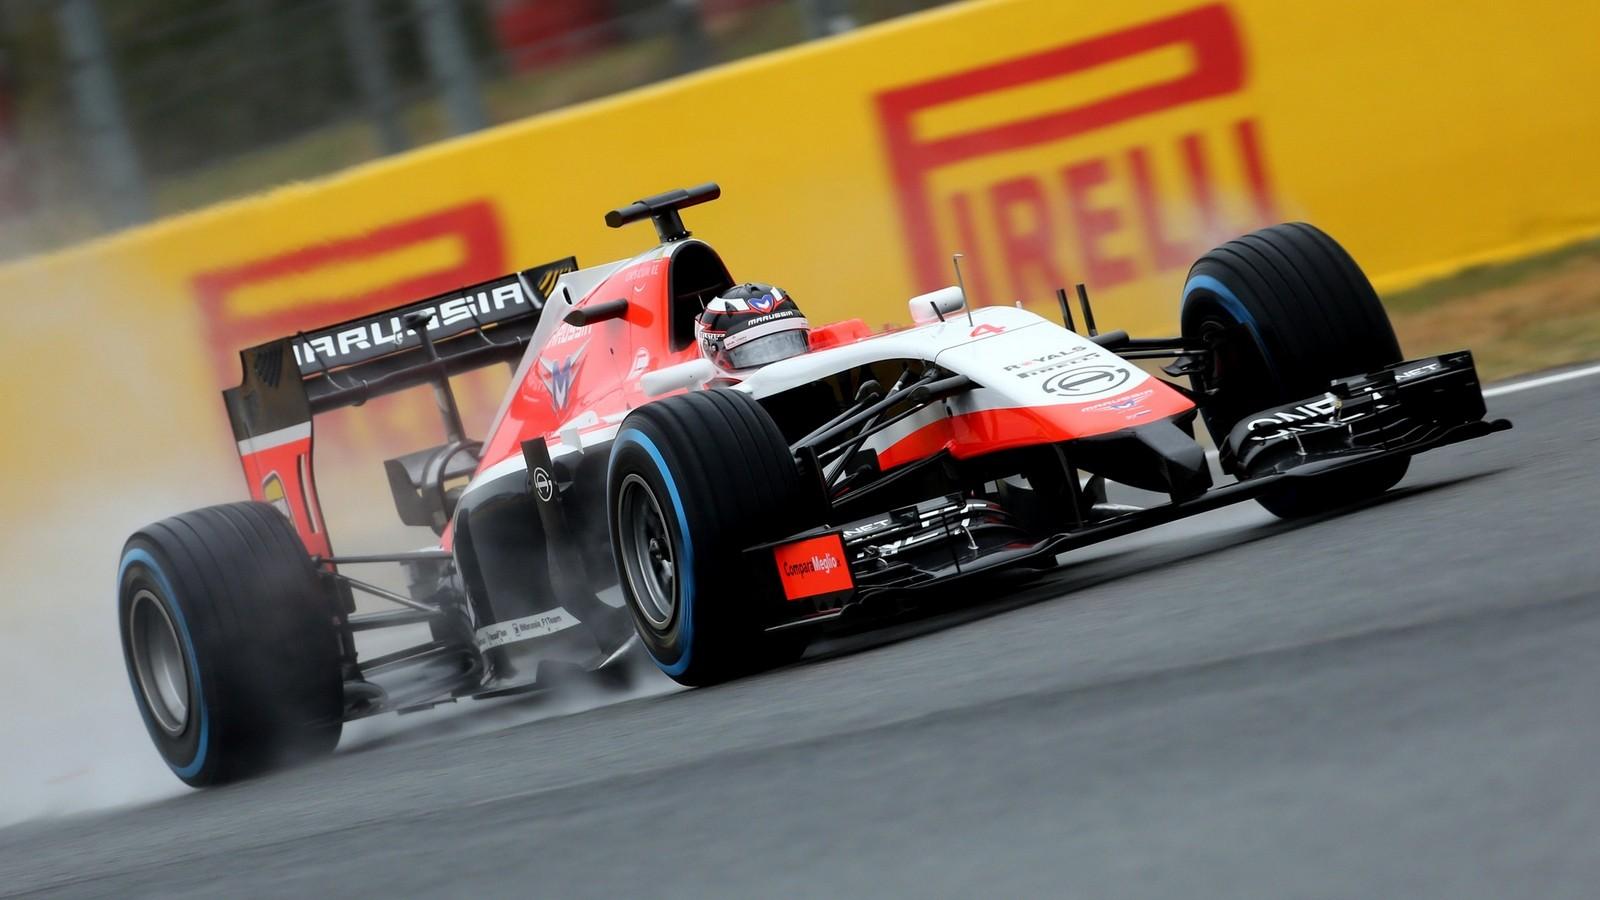 На фото: Marussia MR03 '2014